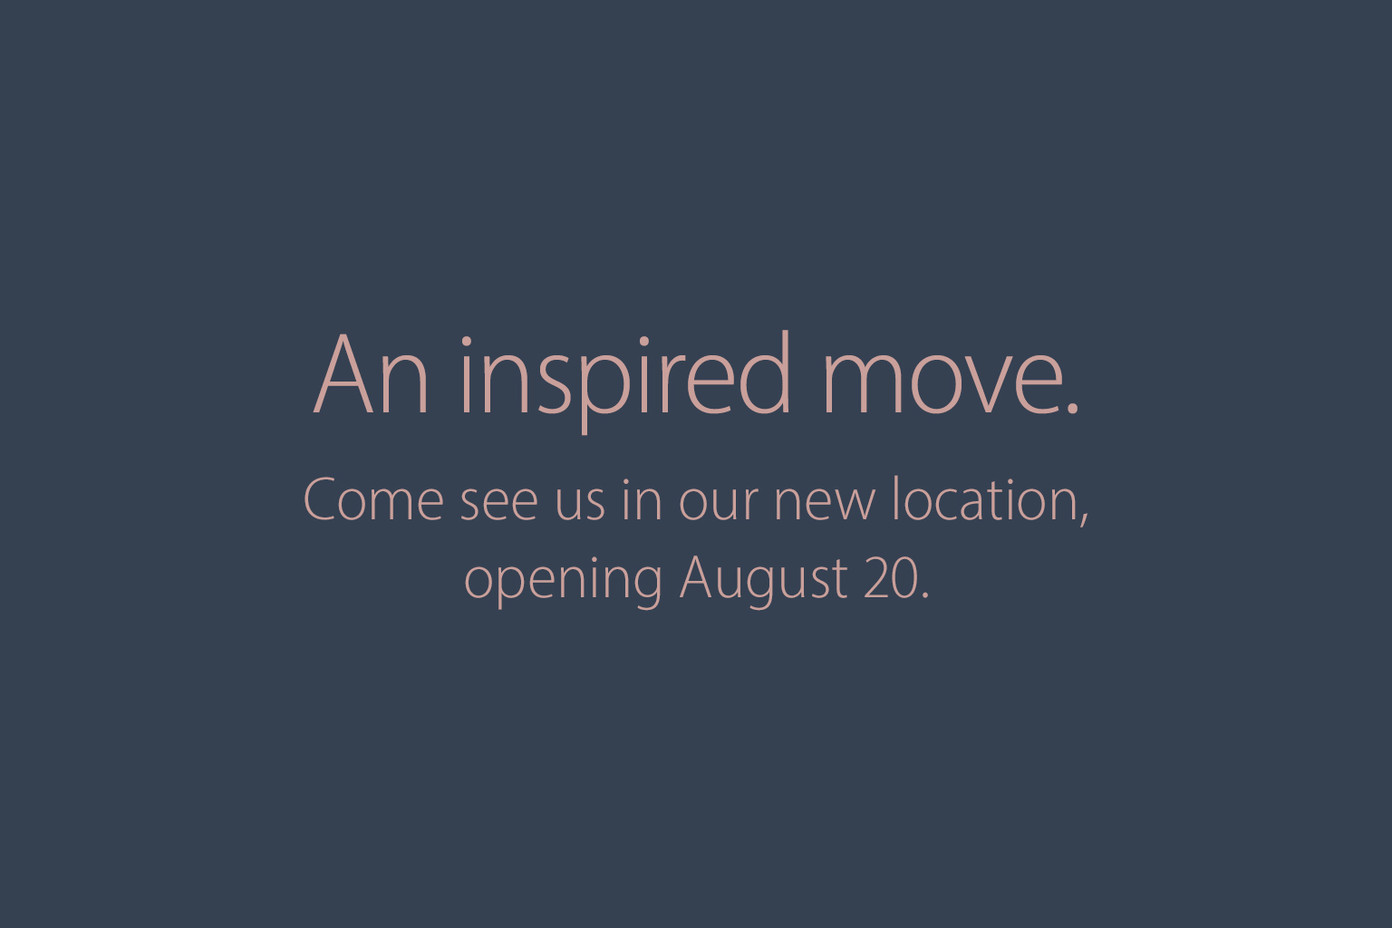 Apple Annapolis store teaser